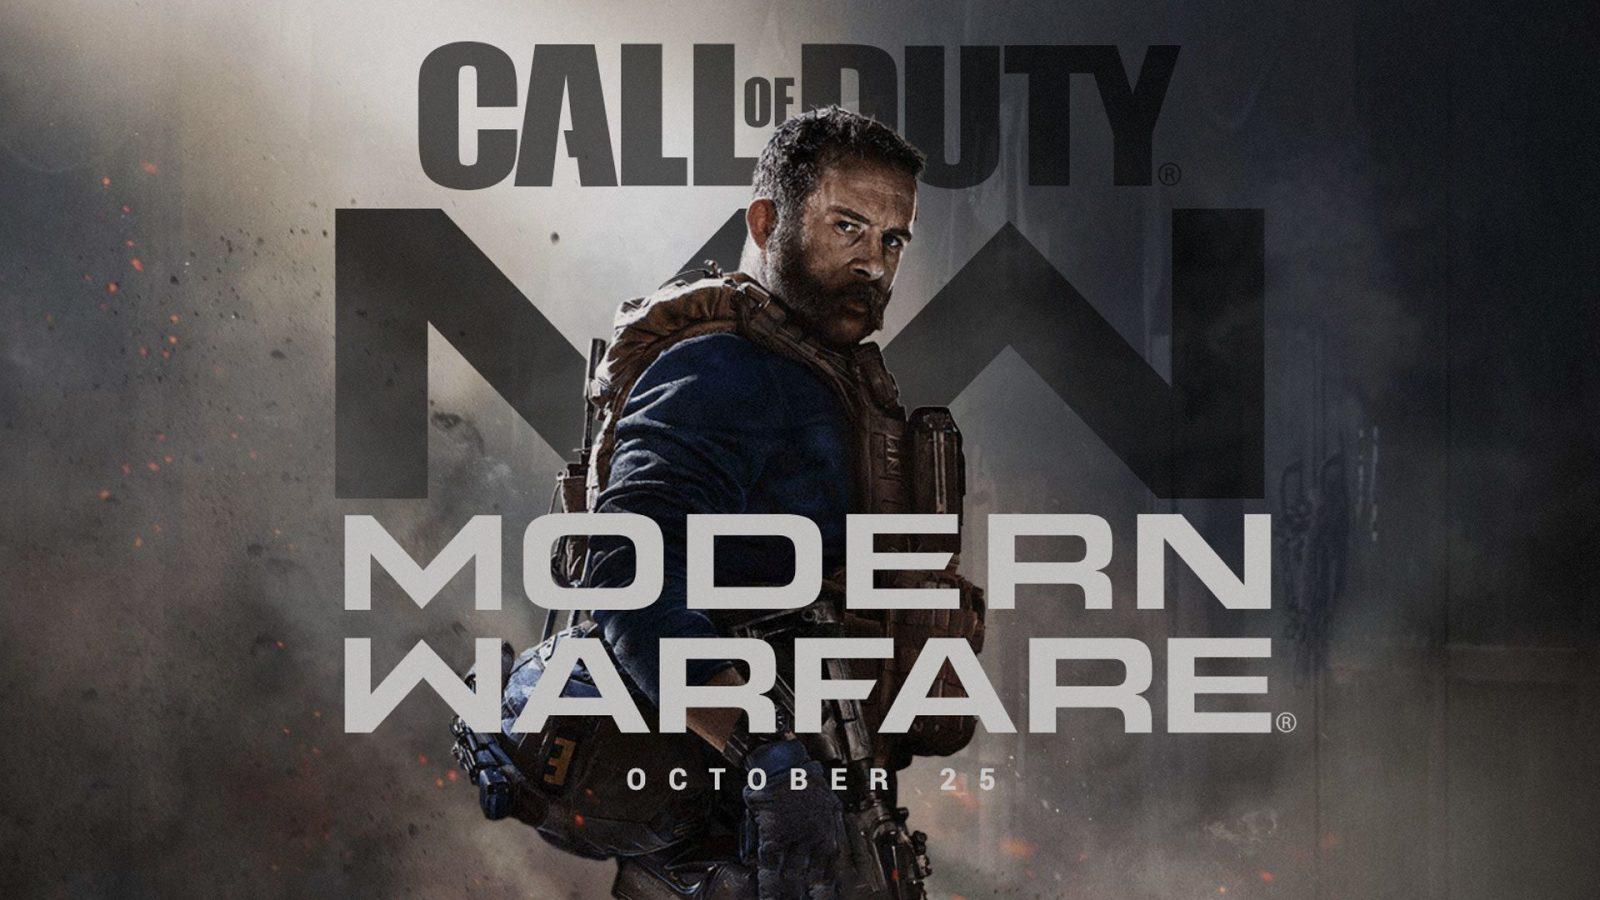 Today's Best Game Deals: COD Modern Warfare $38, Mortal Kombat 11 $20, more